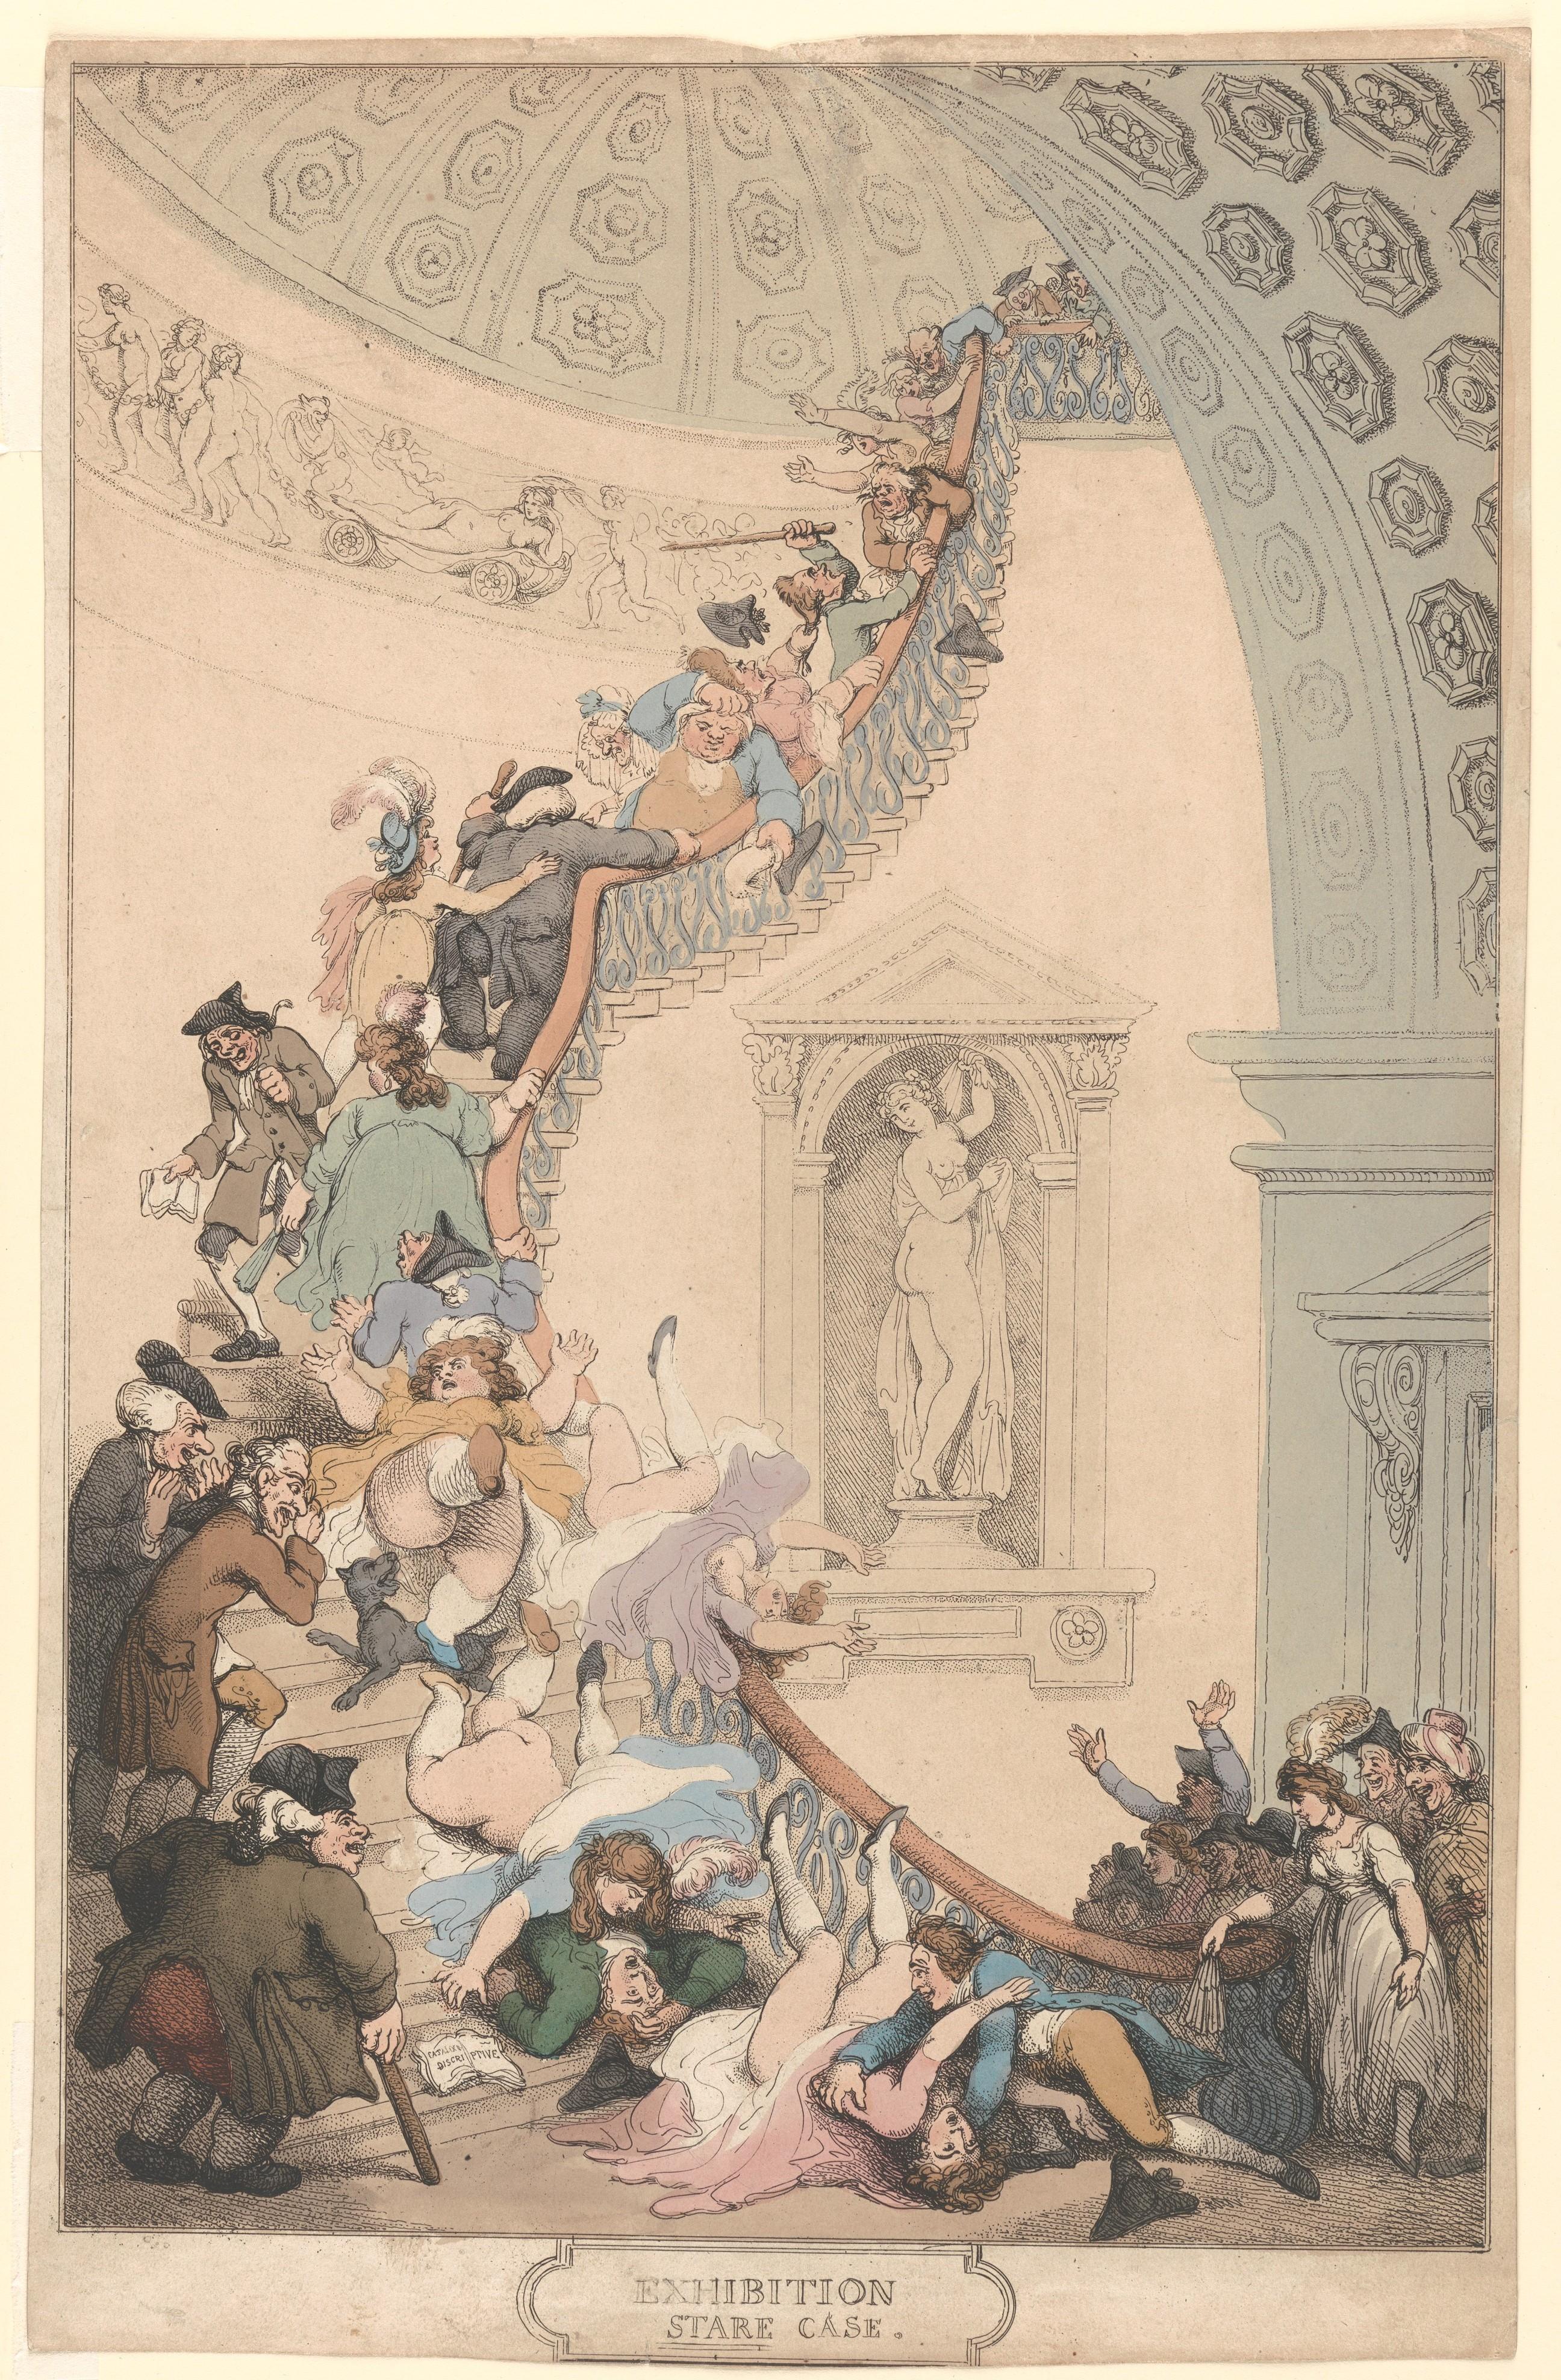 Thomas Rowlandson  Exhibition Stare Case  The Met